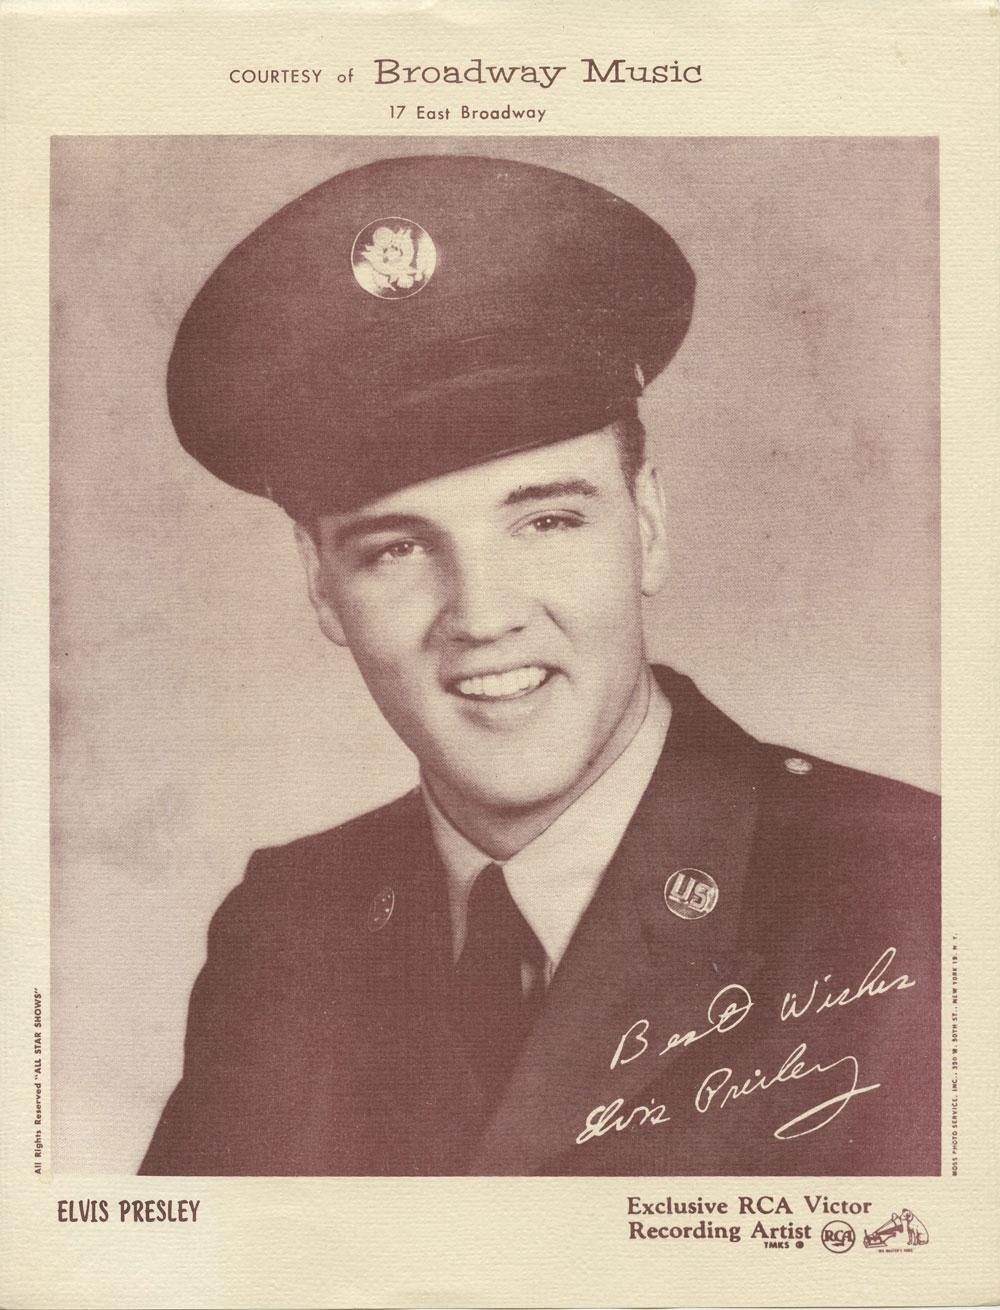 Elvis Presley 1958 In The Army Portrait Photo RCA Victor Recording